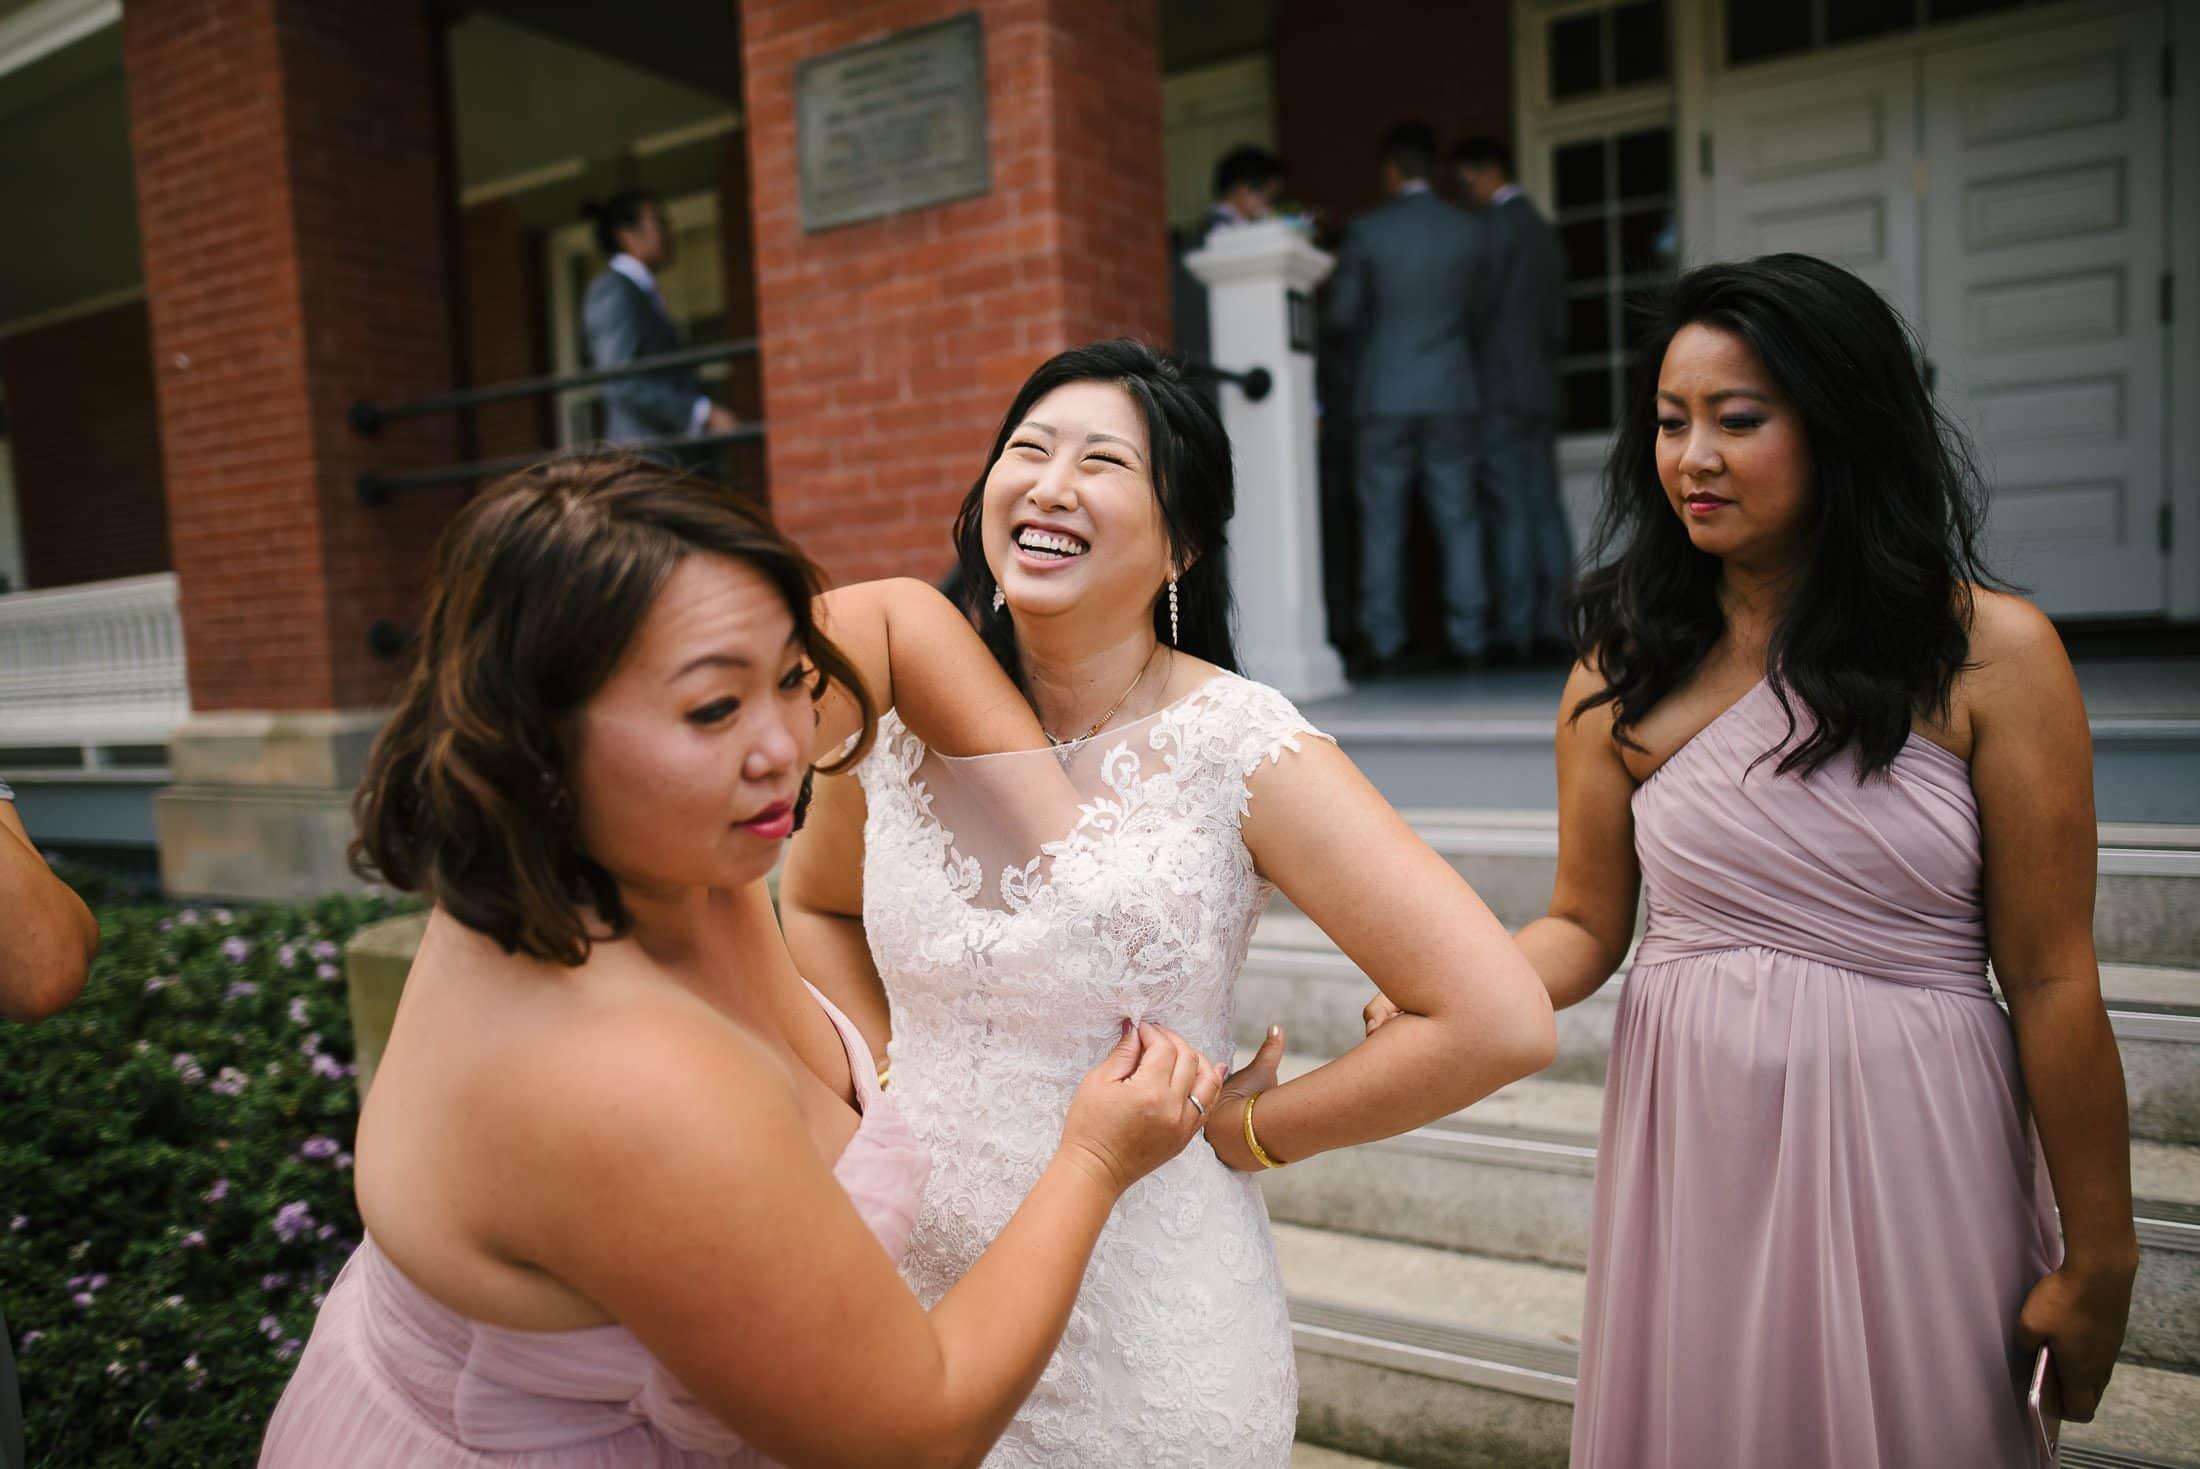 Goofy Presidio Lodge Wedding pic